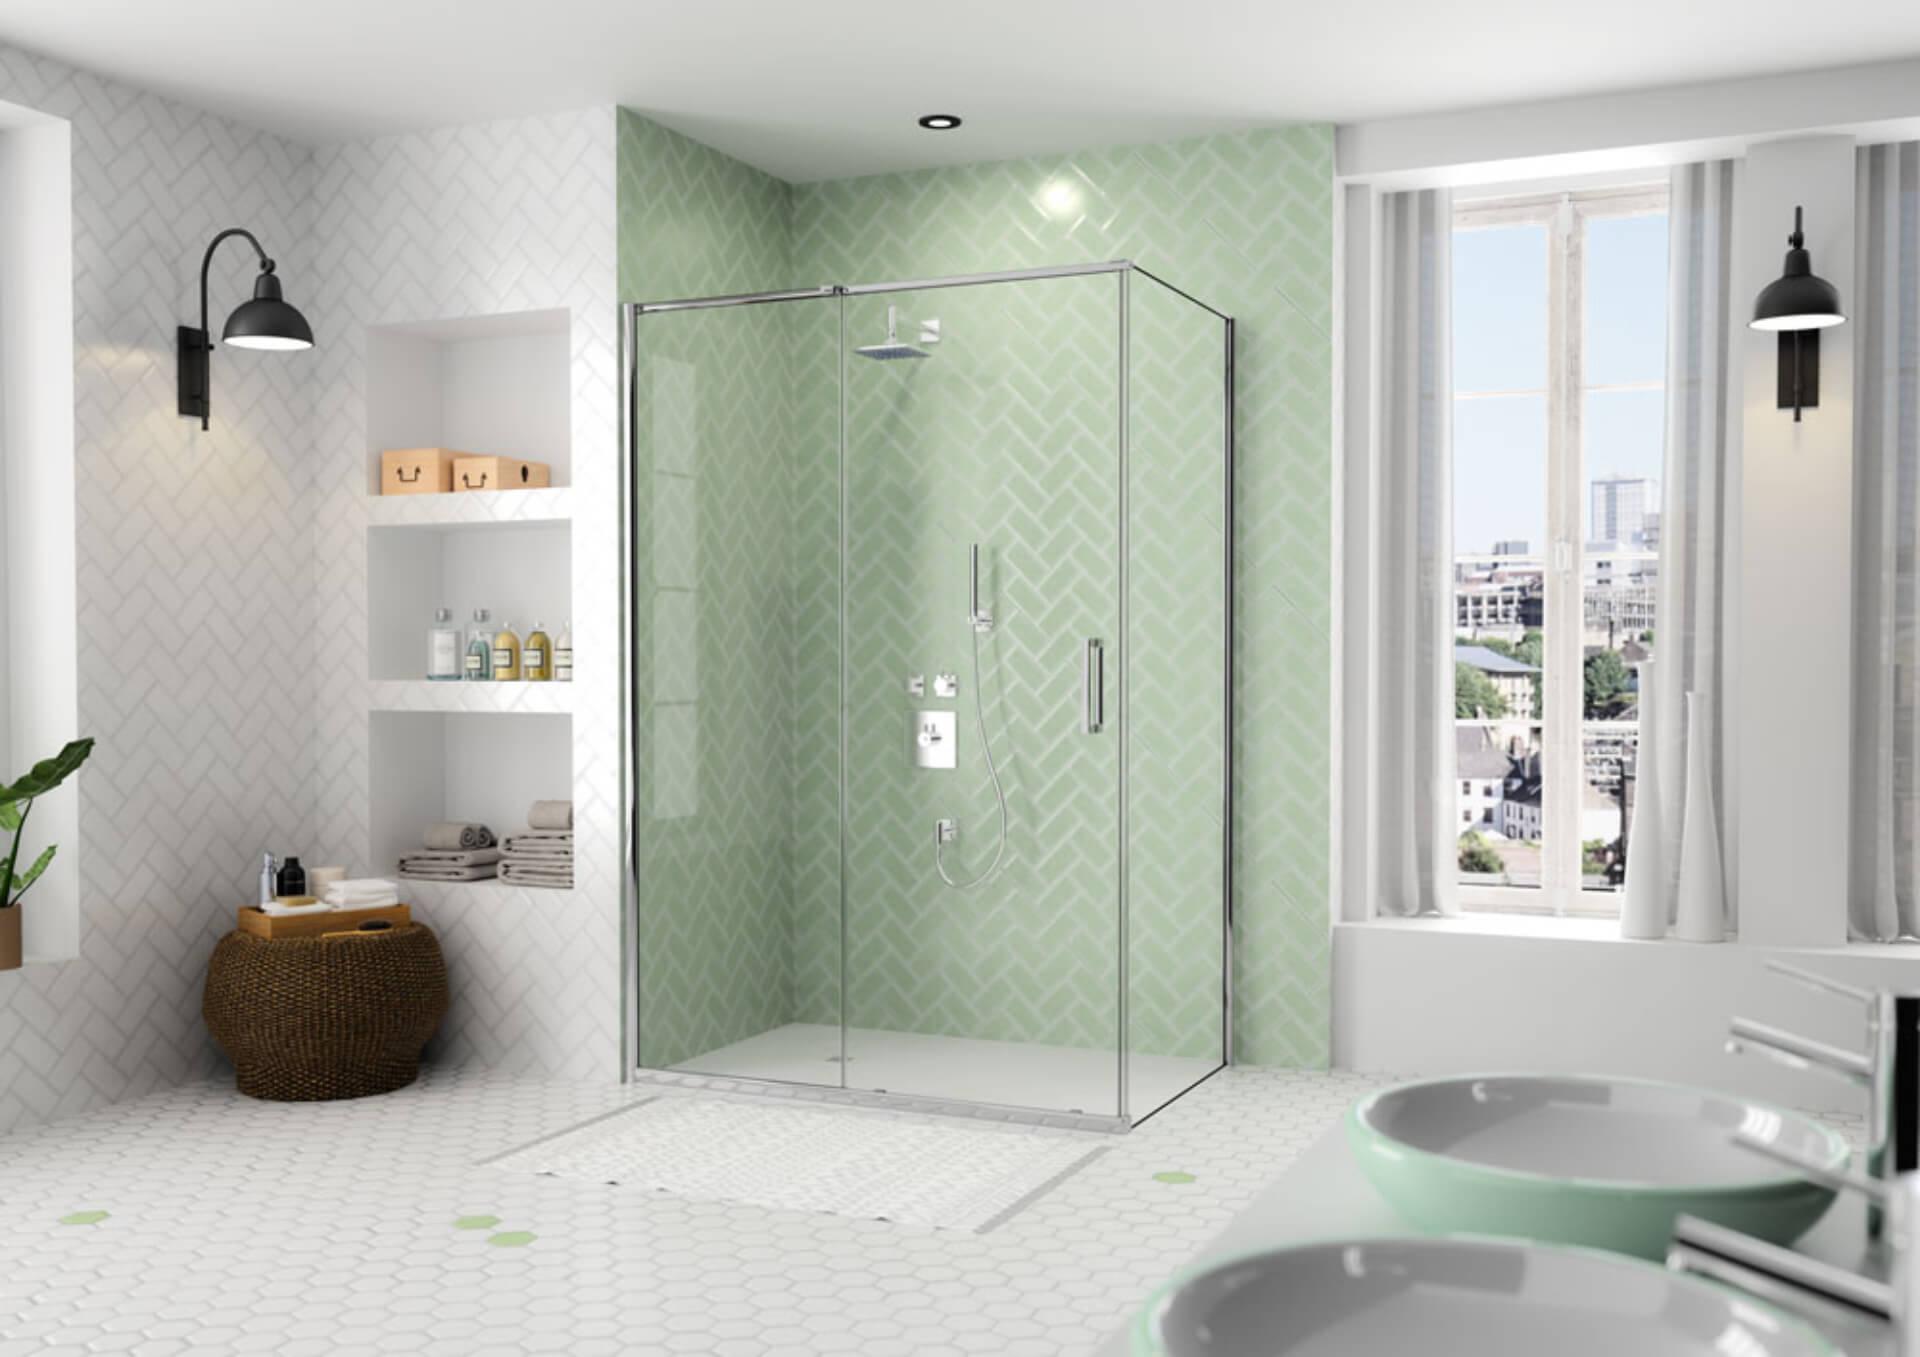 Arysto shower in green